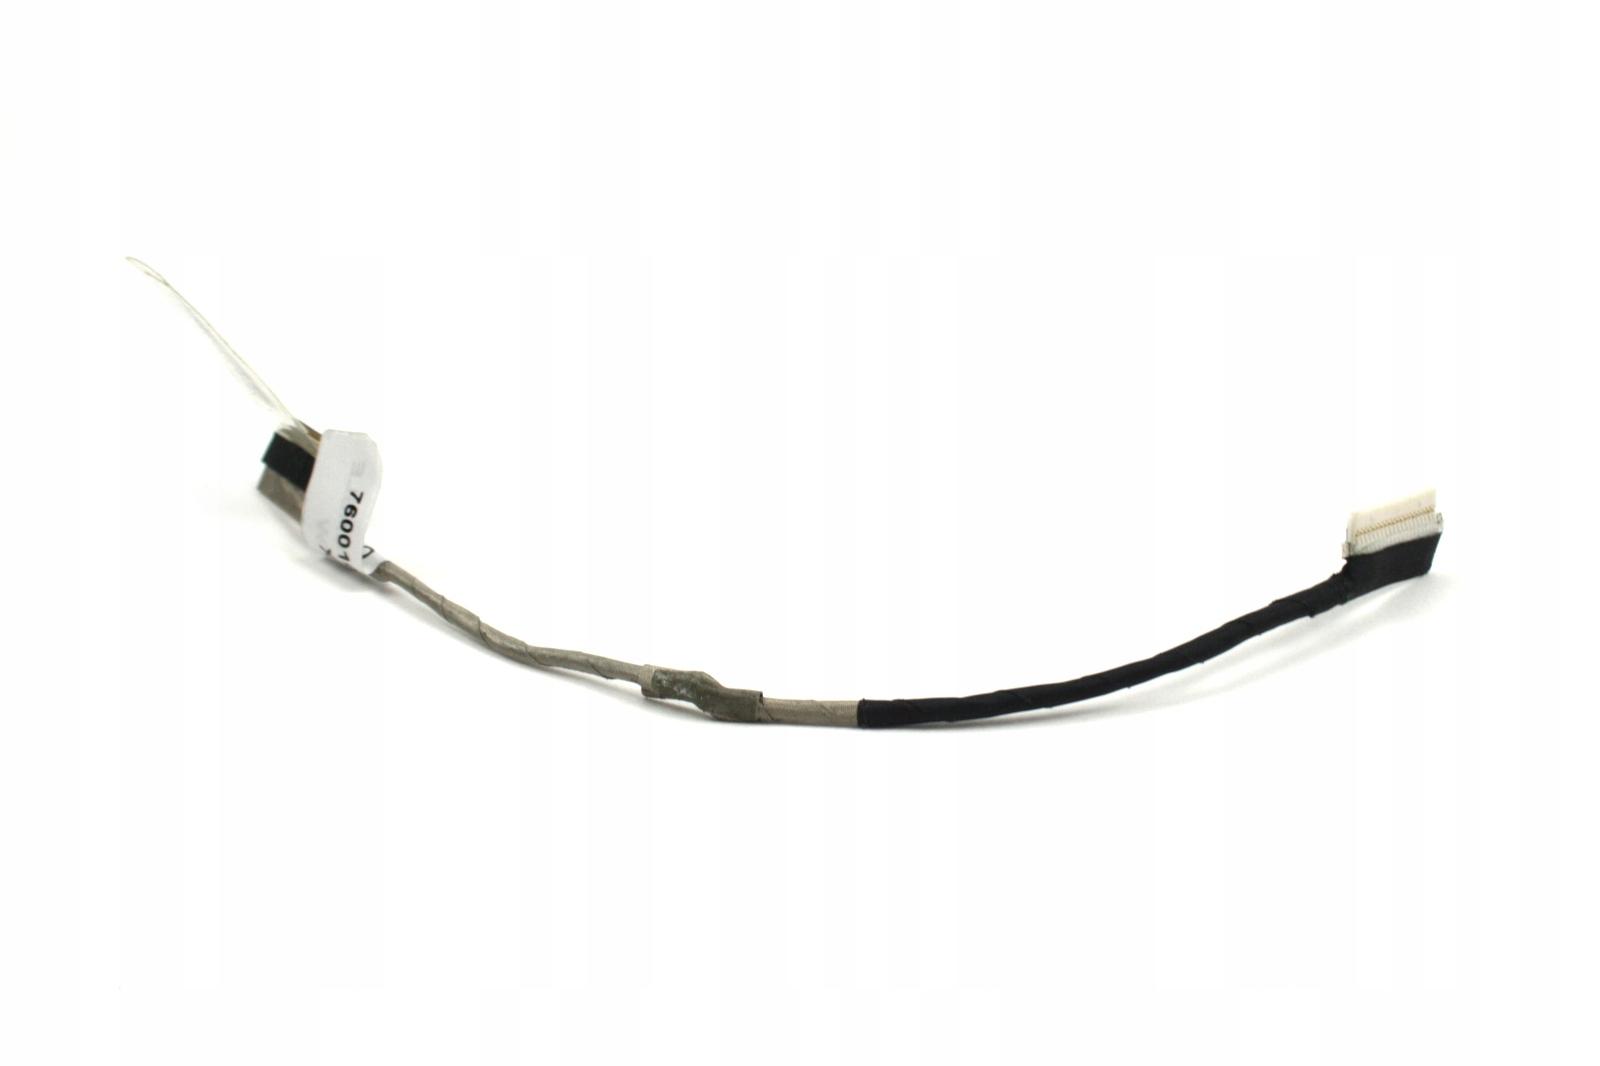 TAŚMA LCD MATRYCY ASUS X101 X101H X101H-1A 14005-00300100, HIGH-TEK (KT524)12/09/24 - Taśmy i inwertery